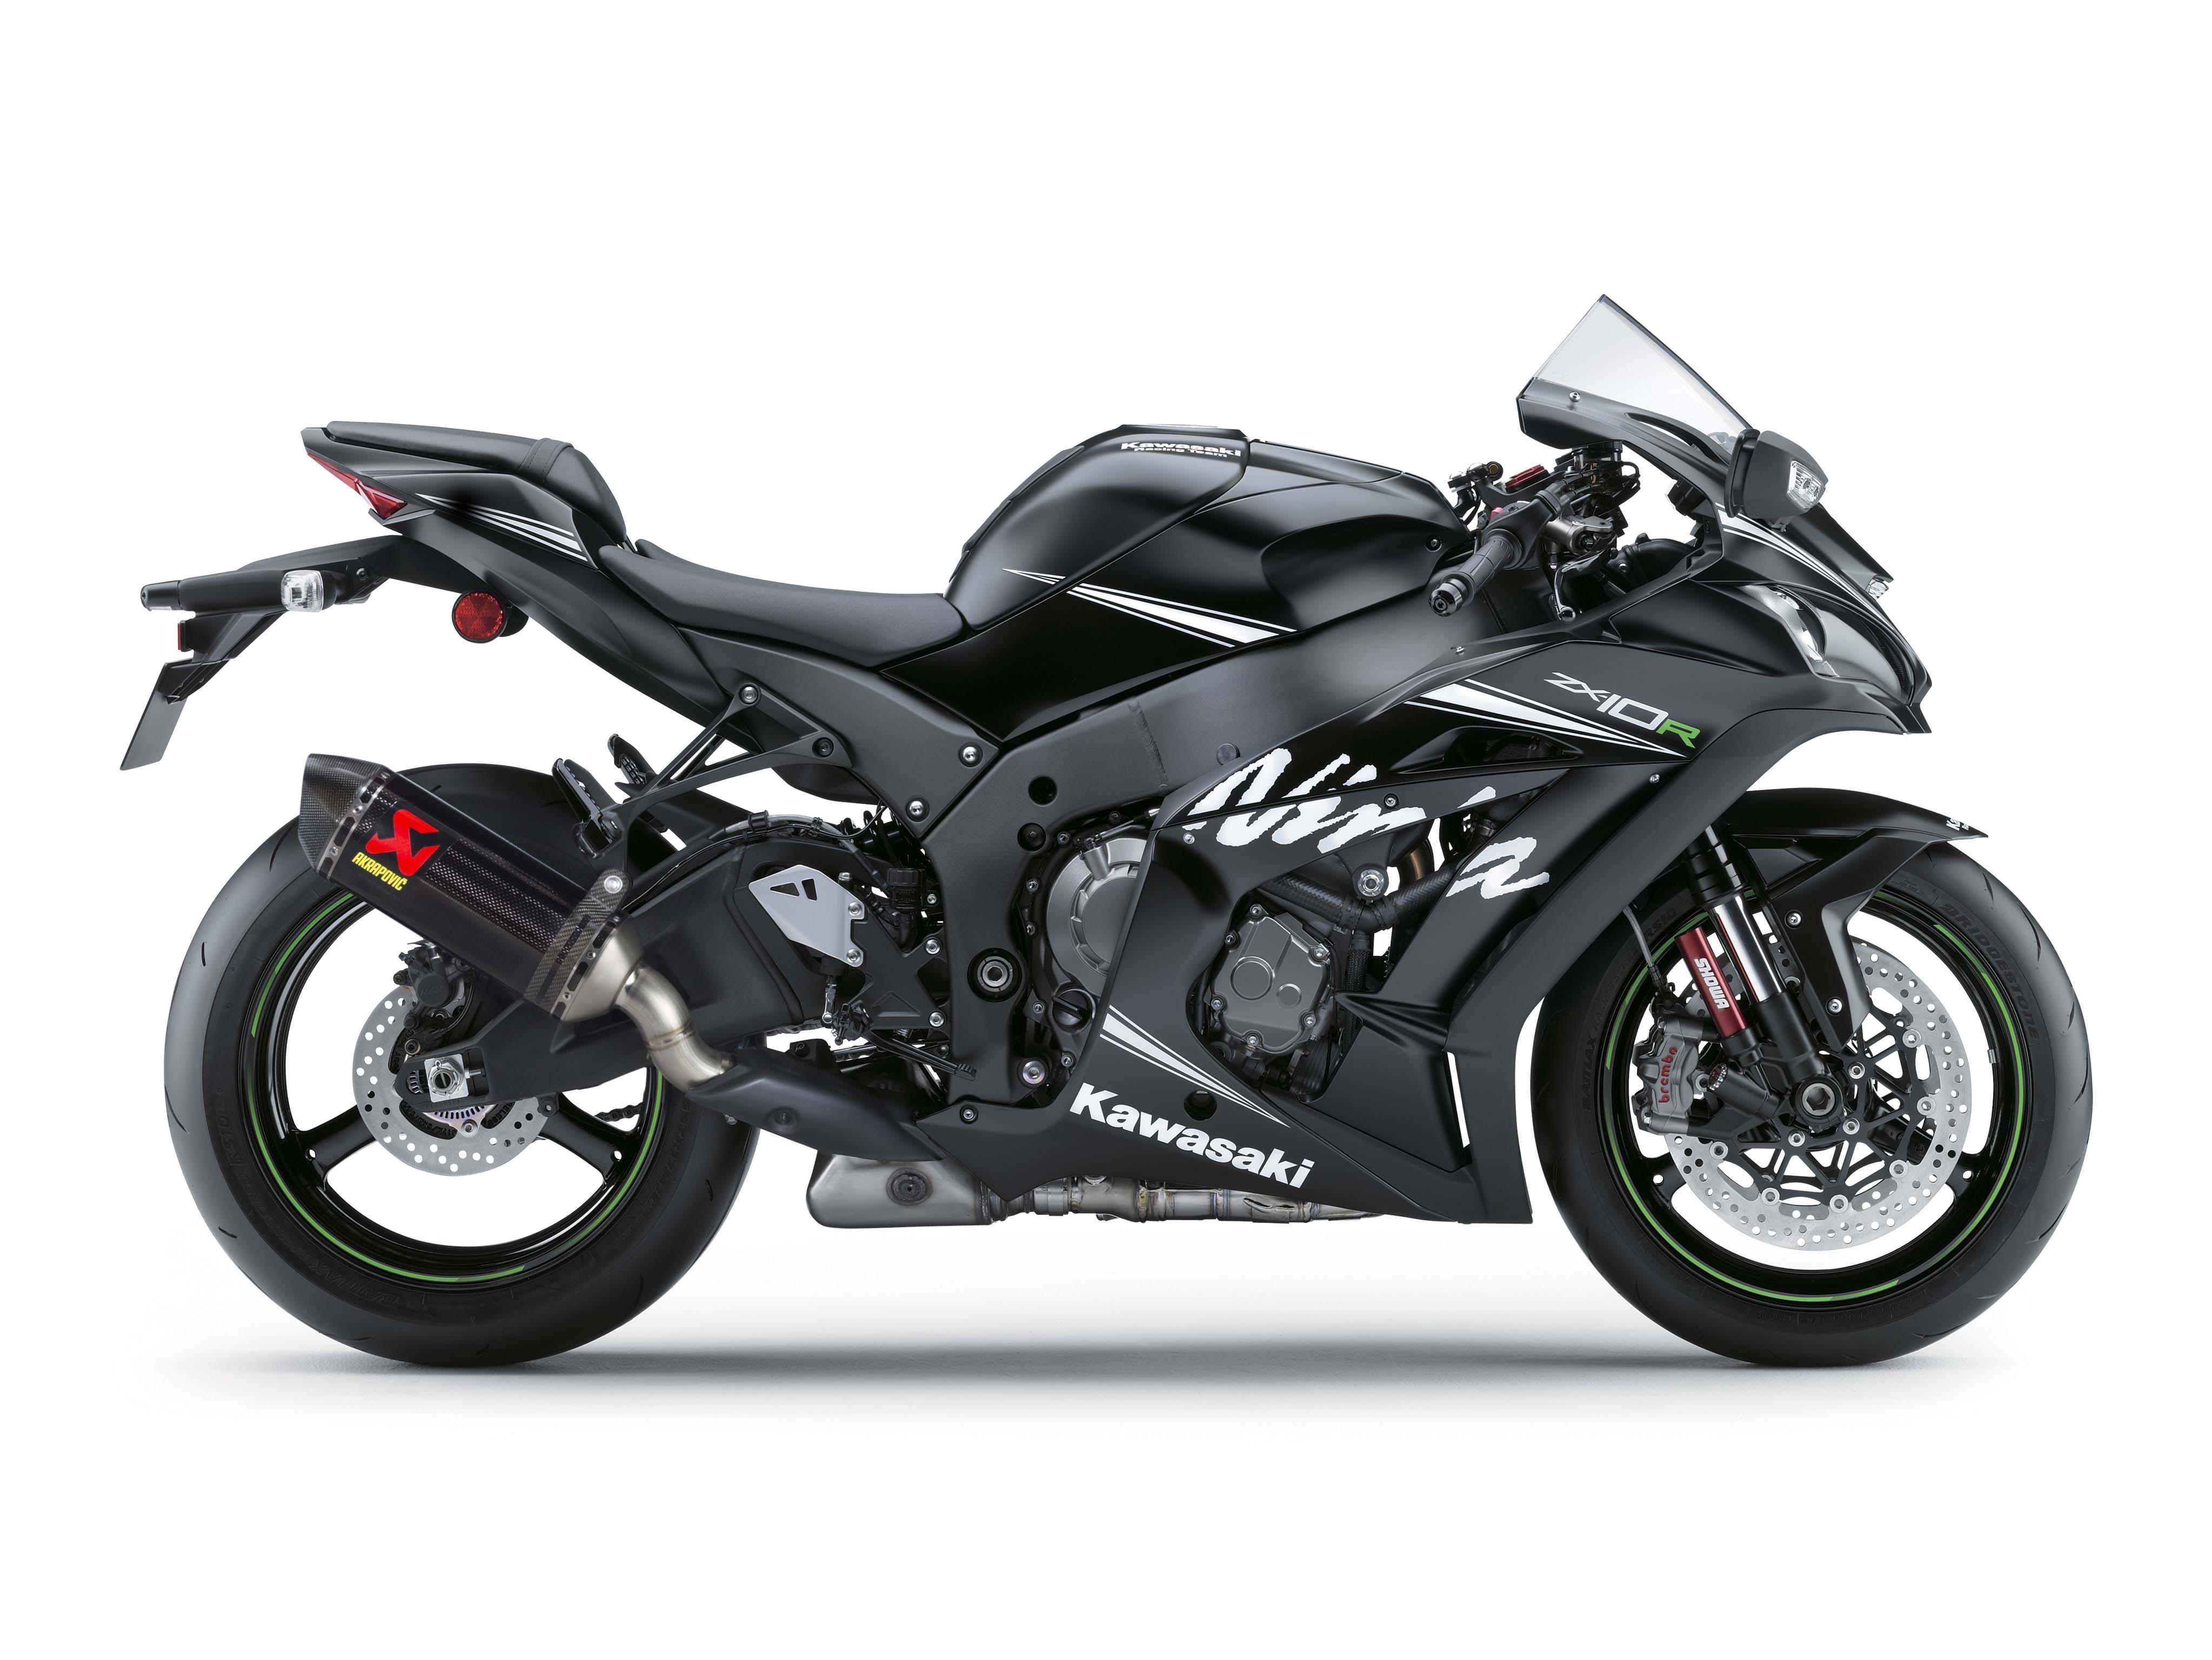 2016 Kawasaki Ninja ZX 10R Winter Test Edition